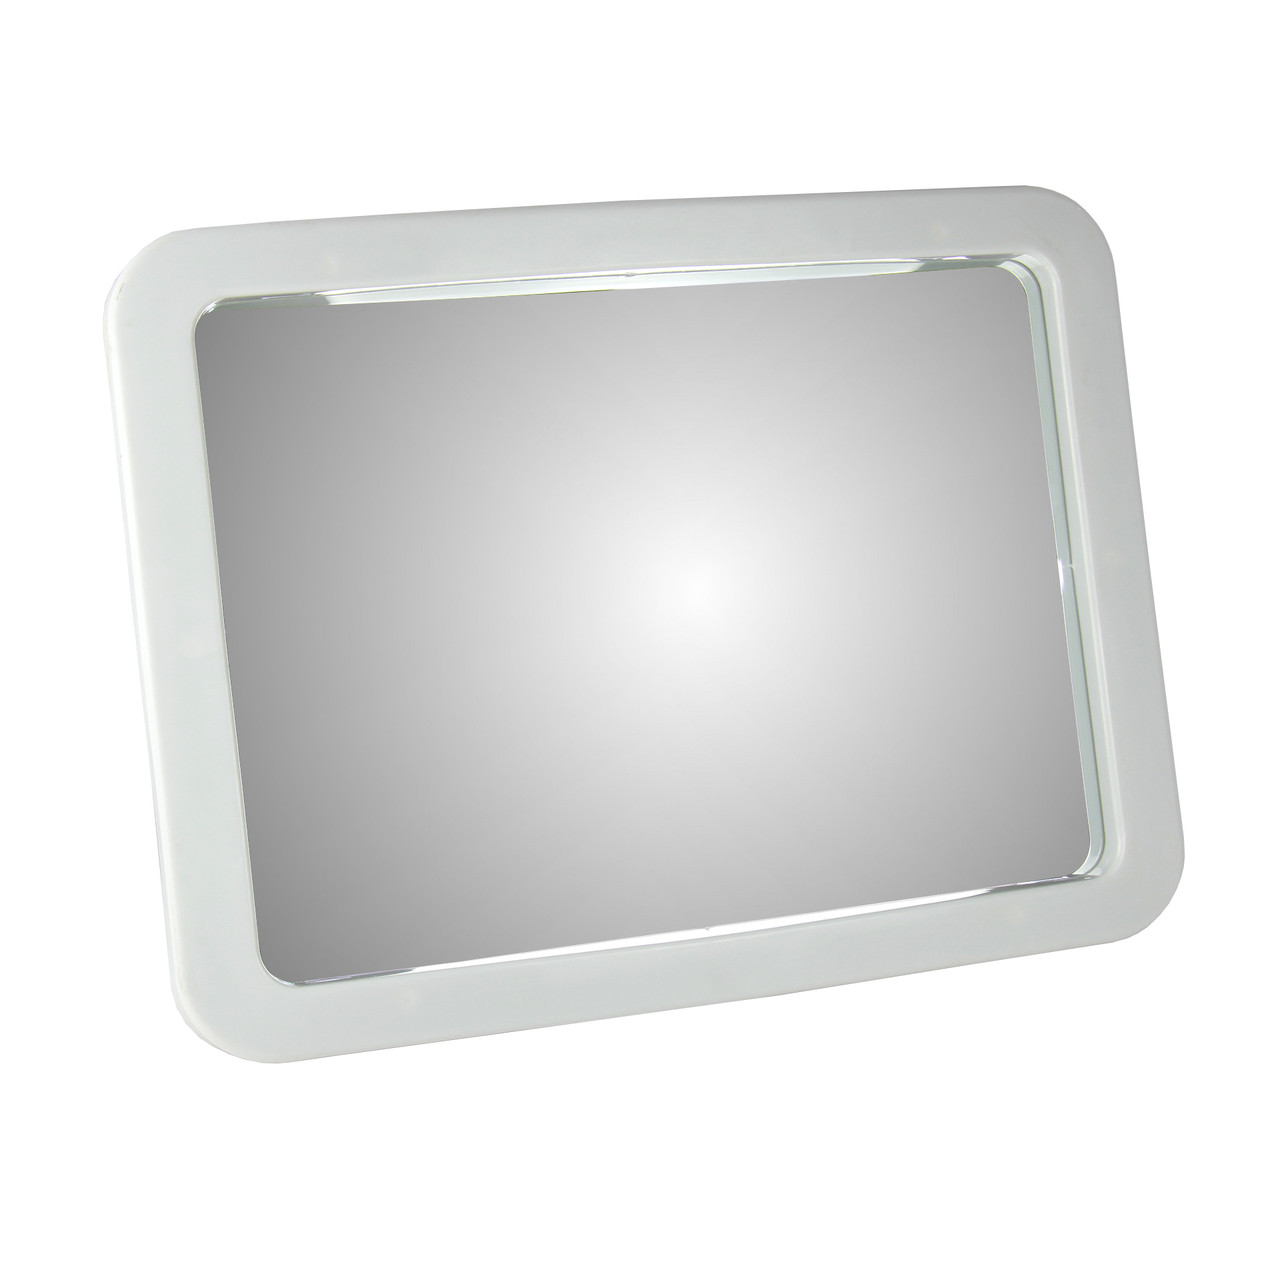 Зеркало 46х36 с пластиковой рамкой